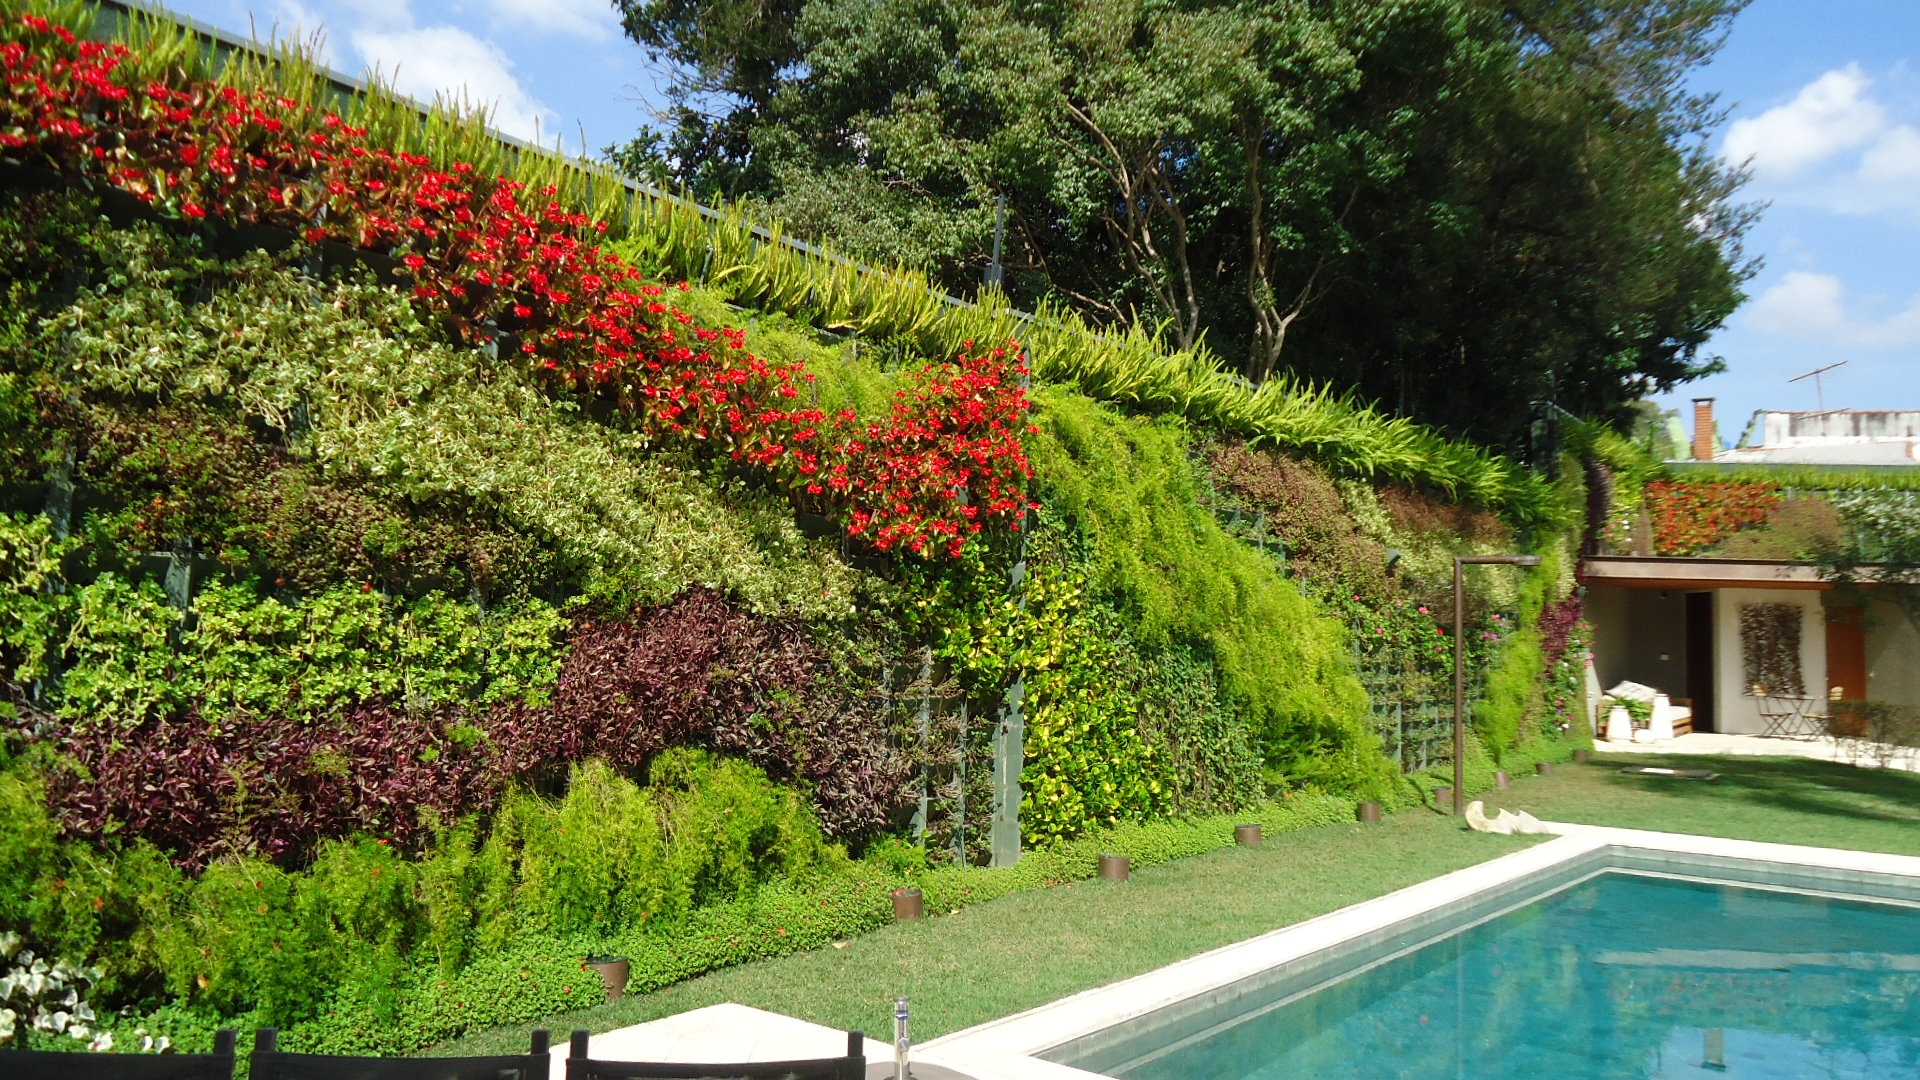 jardim vertical no muro : jardim vertical no muro:JARDIM VERTICAL, INSPIRE-SE